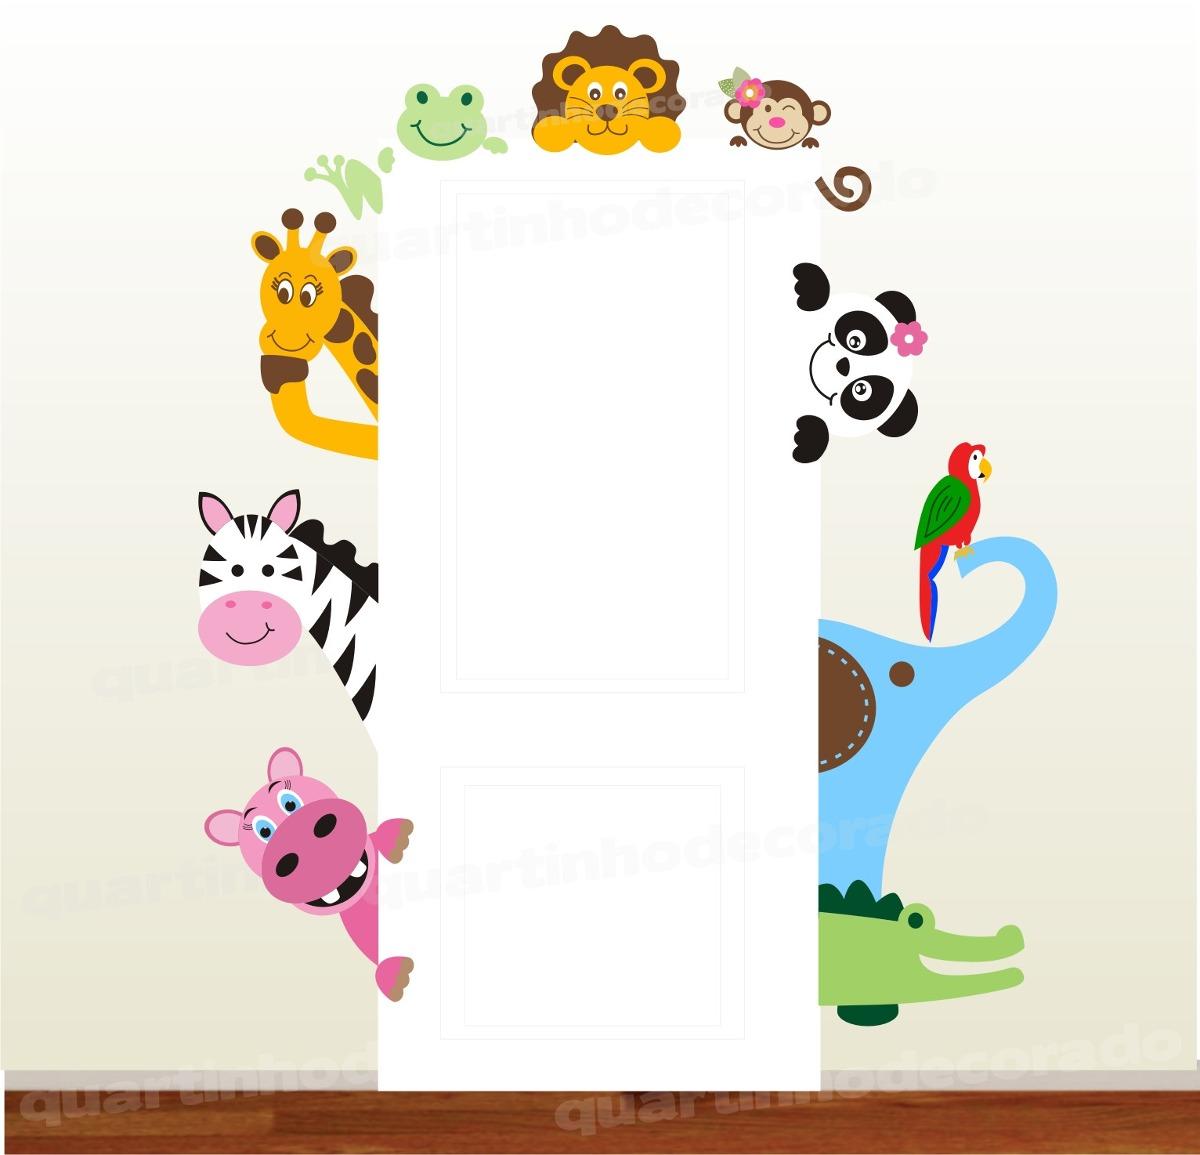 Adesivo Geladeira Inteira Mercado Livre ~ Adesivo Infantil Safari Porta Decorativo Parede Bebe Zoo 64 R$ 148,00 no MercadoLivre